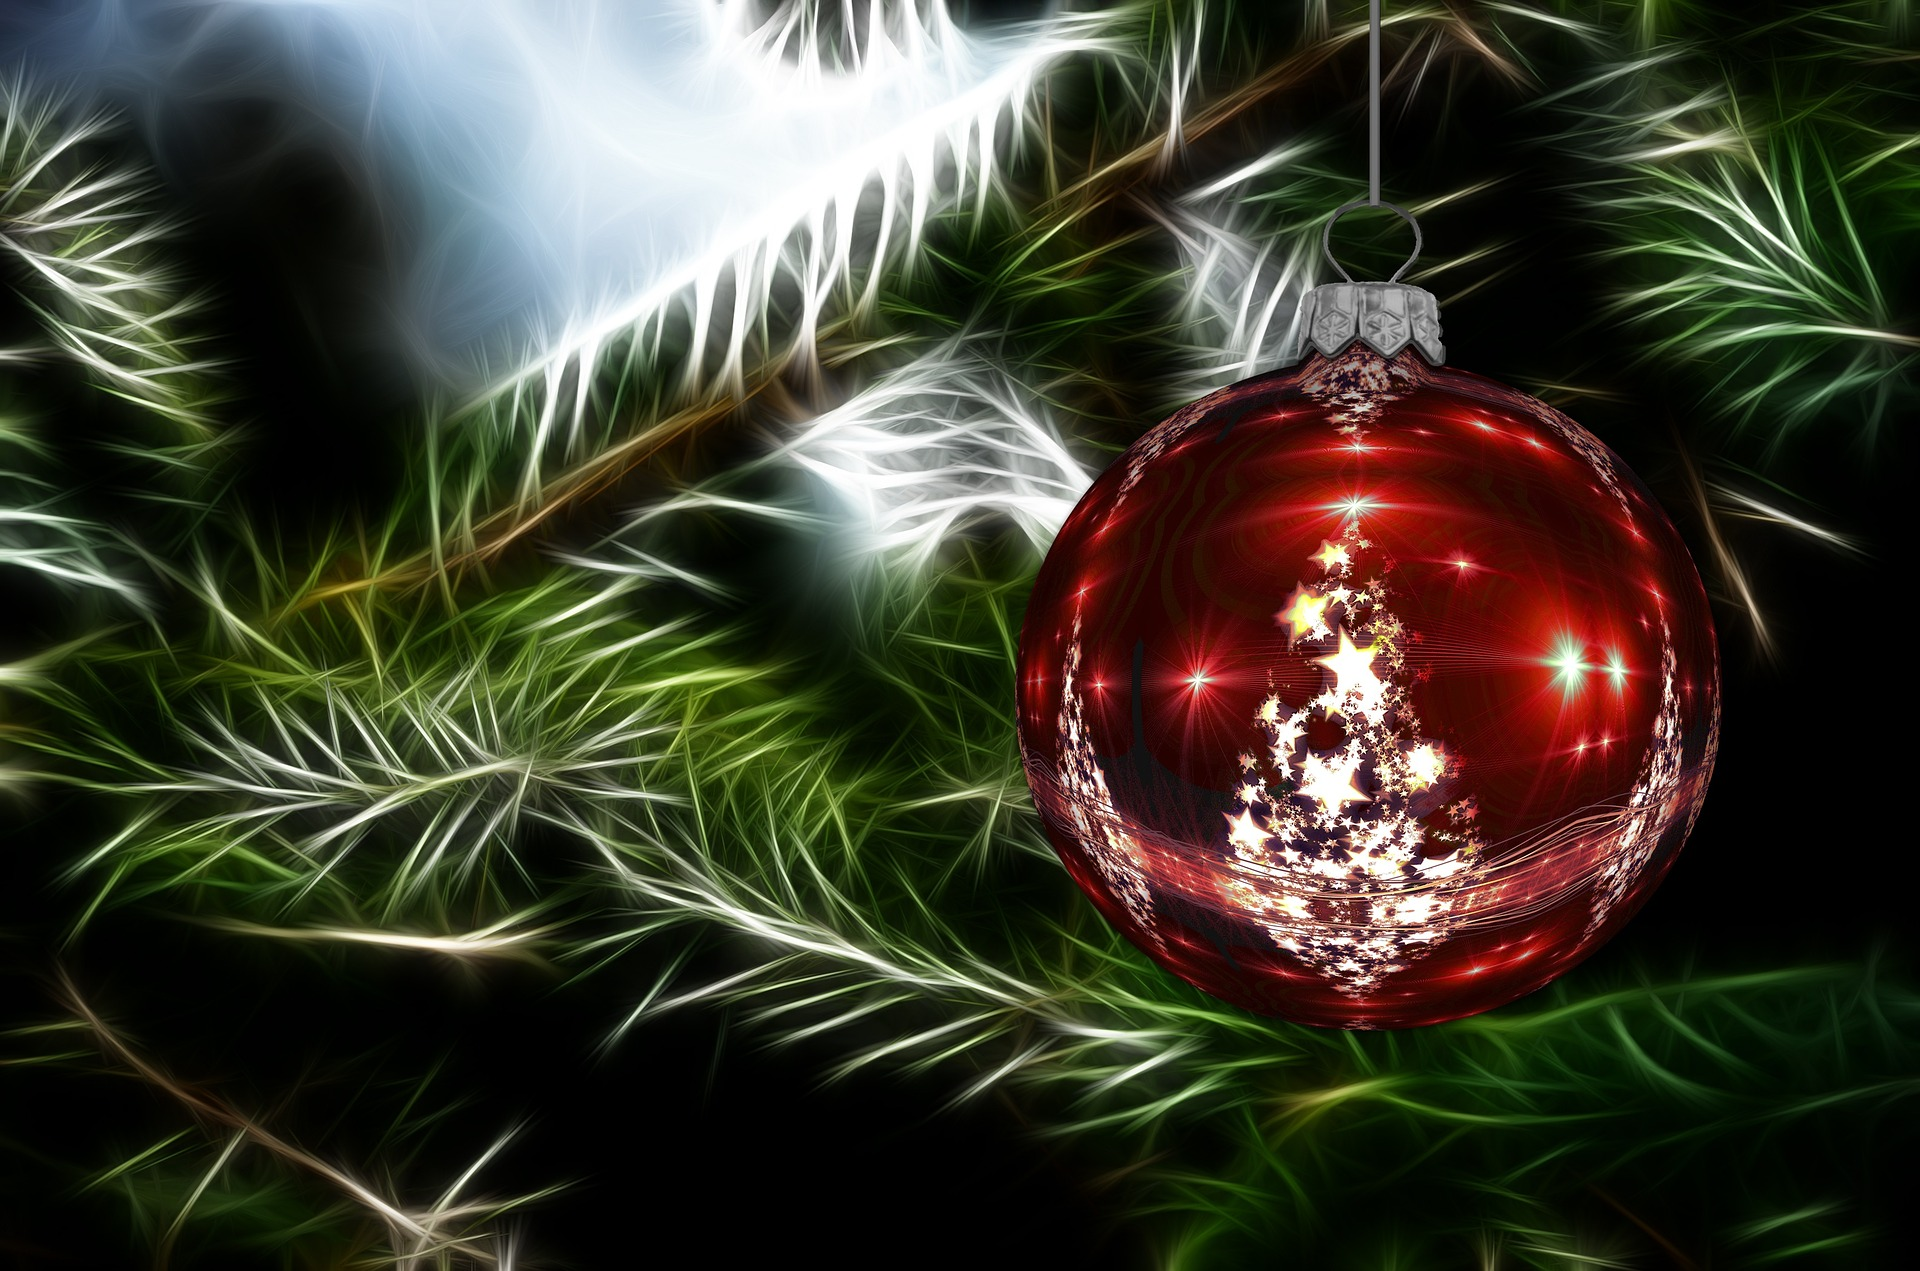 christmas-ornament-1033279_1920